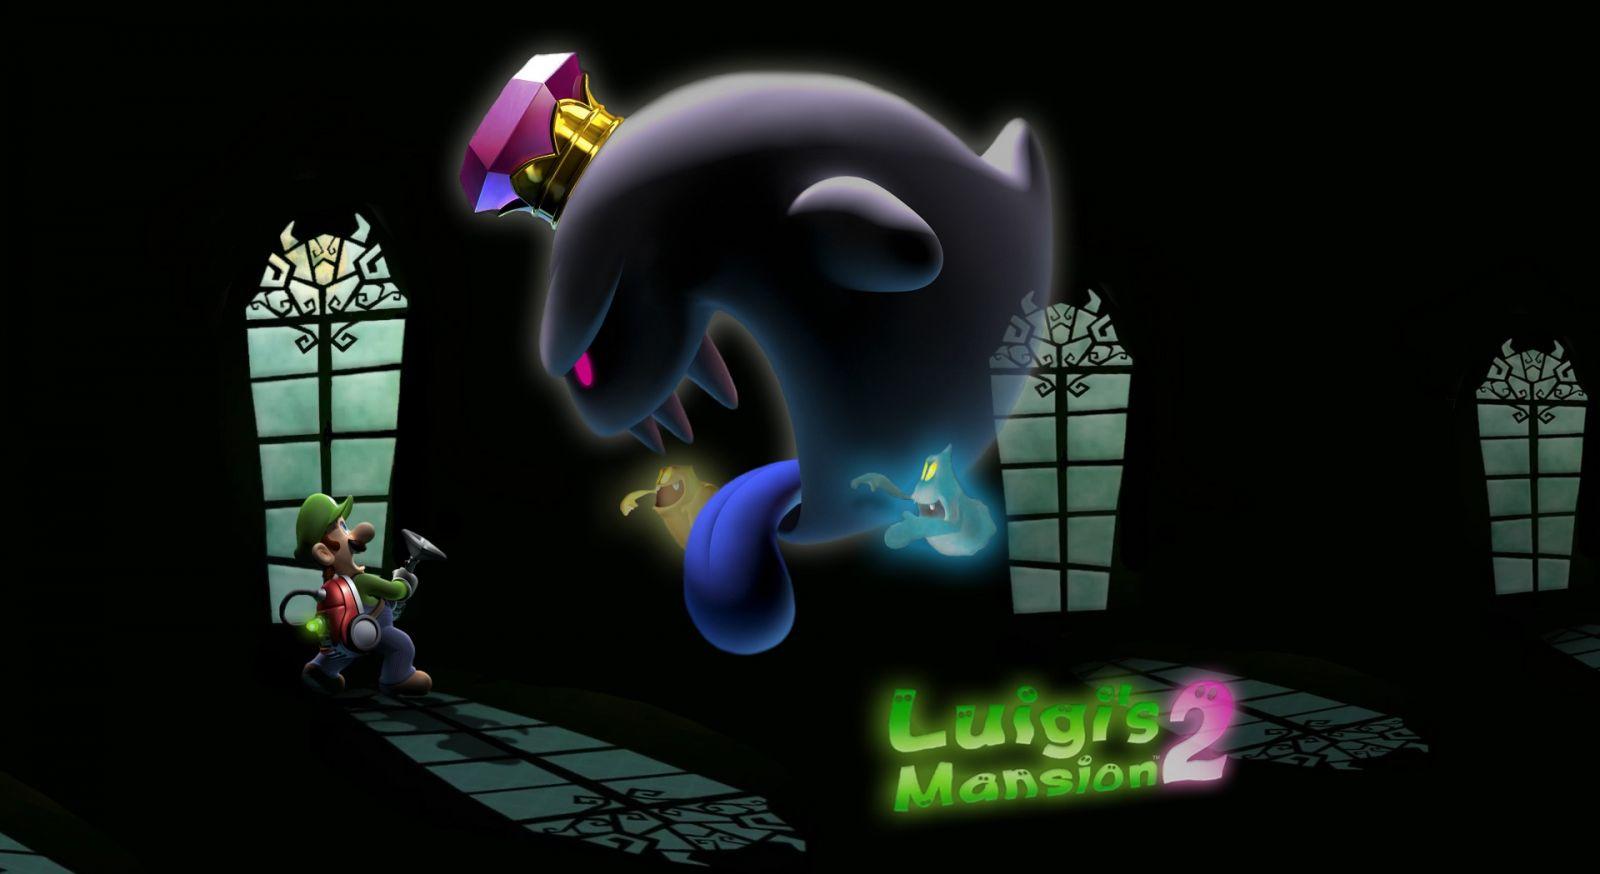 luigi__s_mansion_2___wide_by_alenintendo